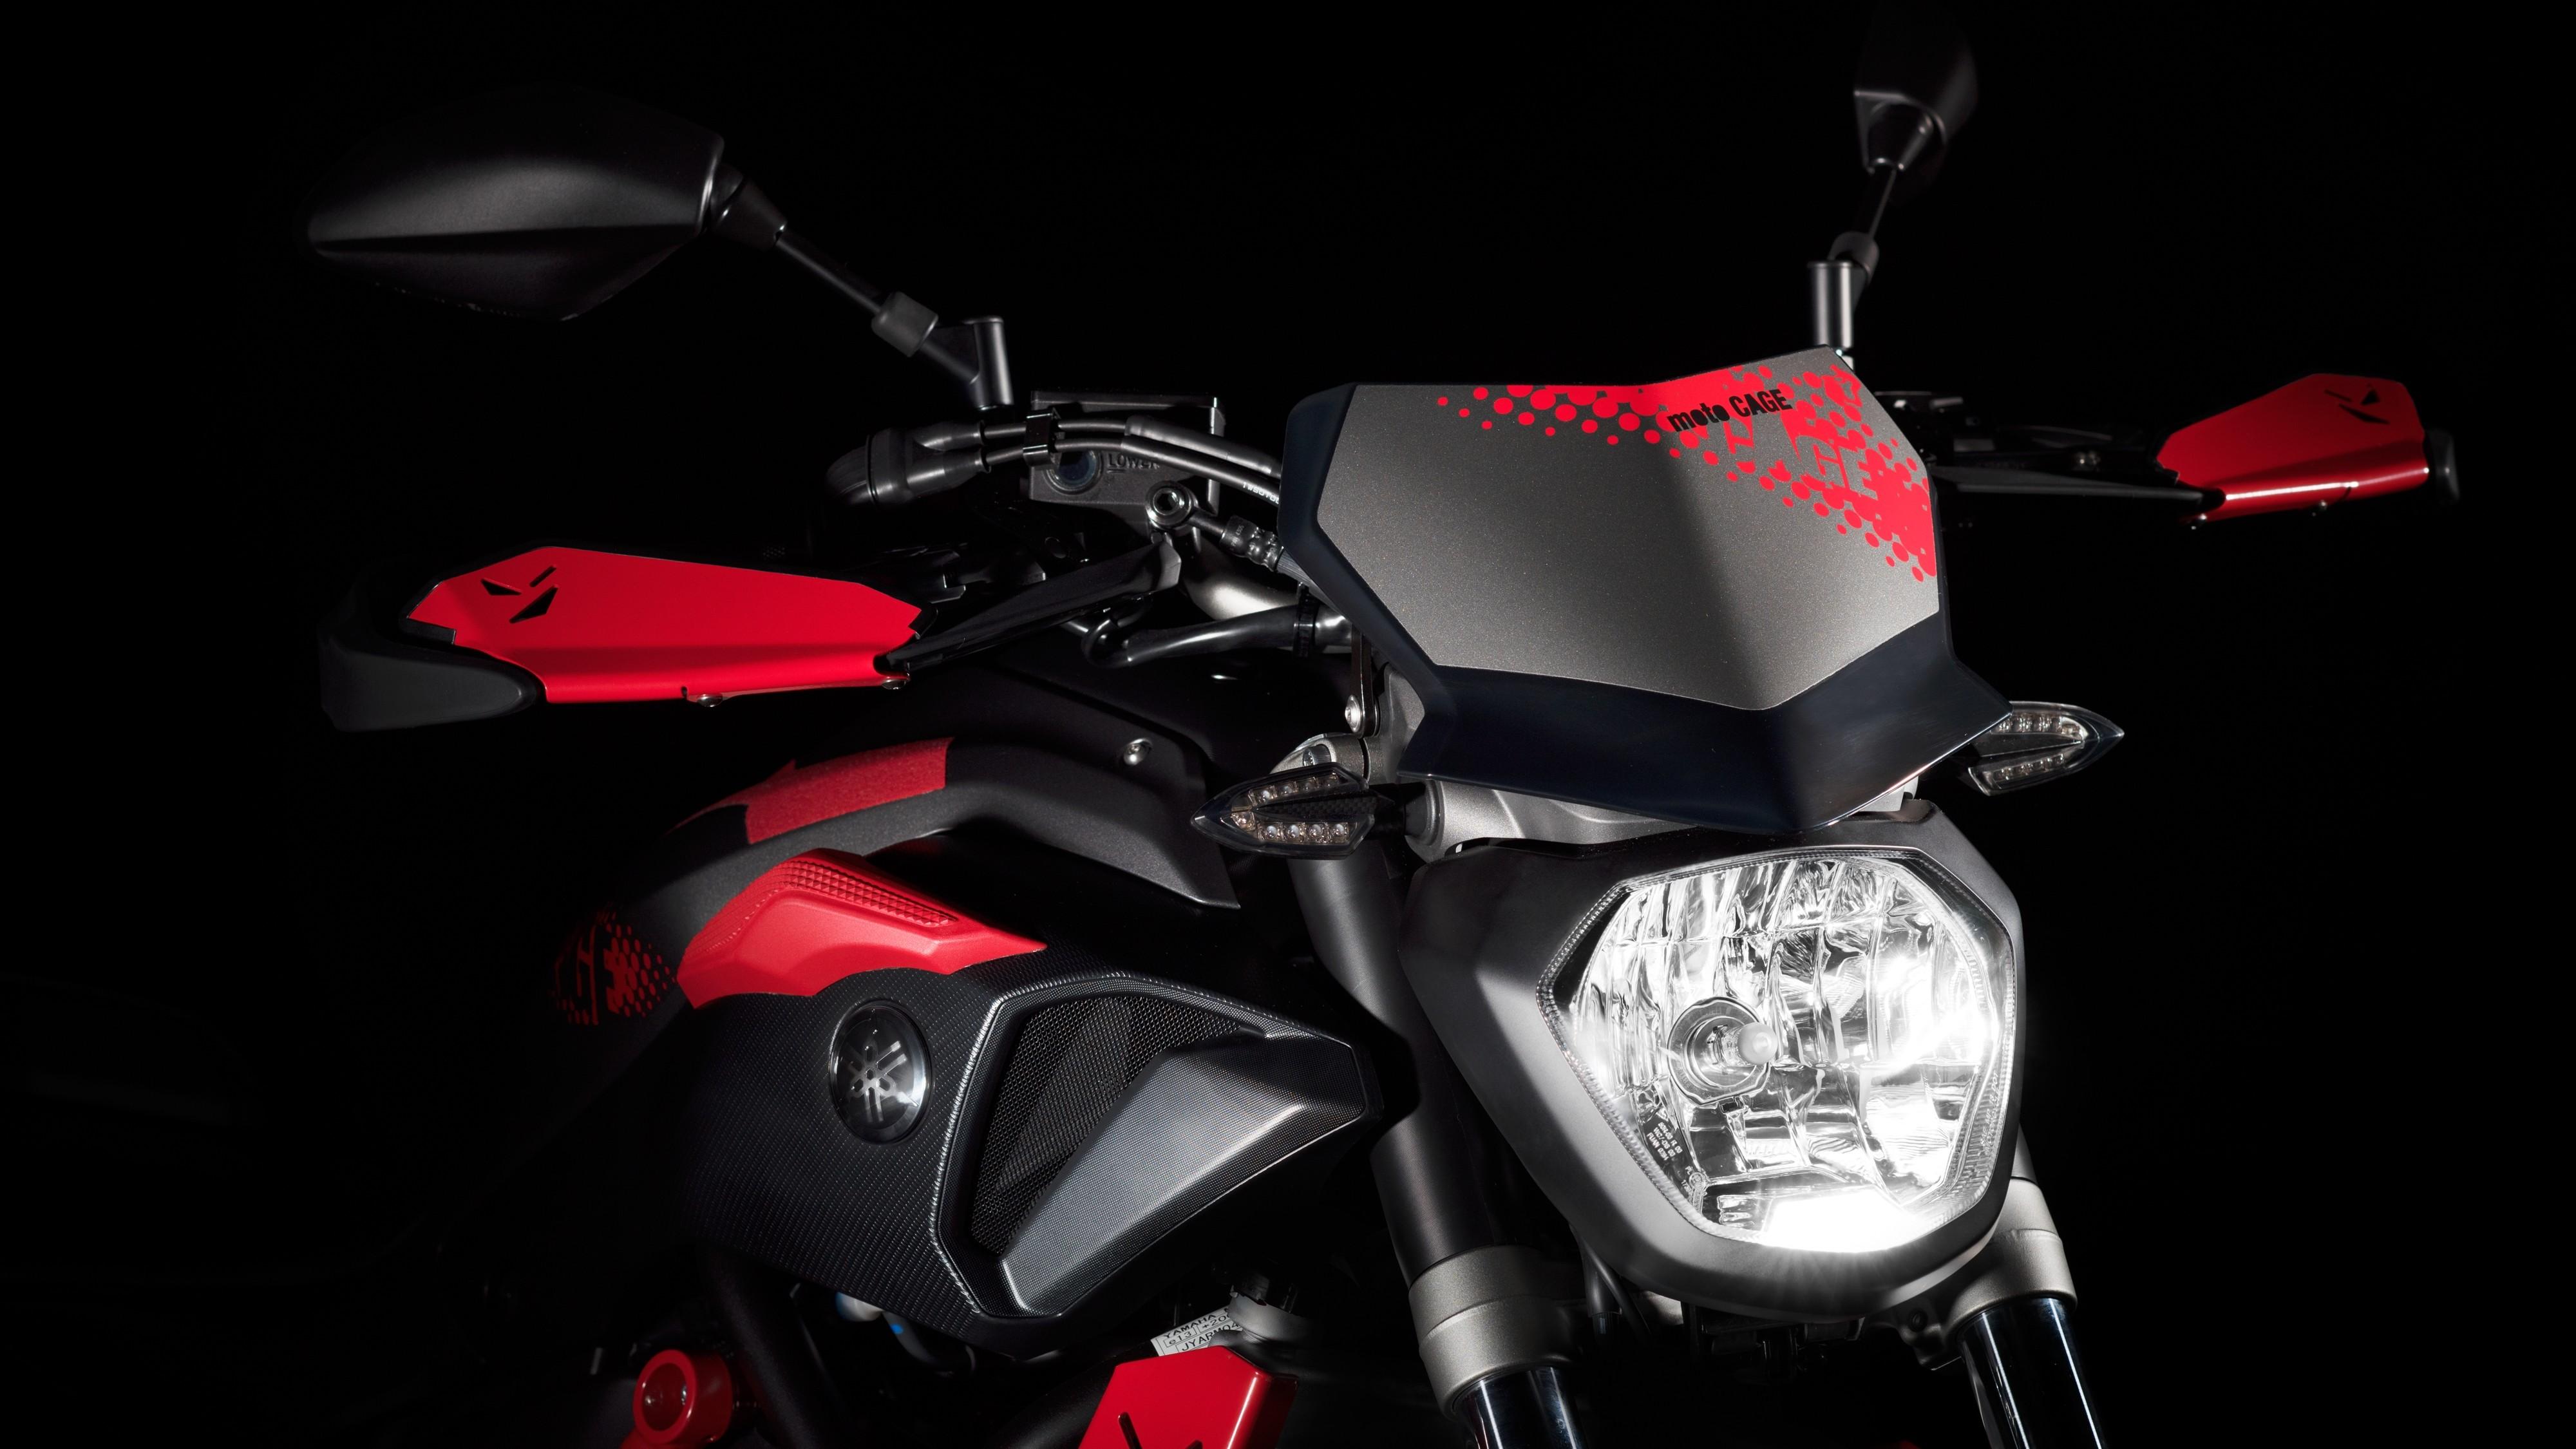 For Sale: Yamaha MT-07 Moto Cage • The Bike Market